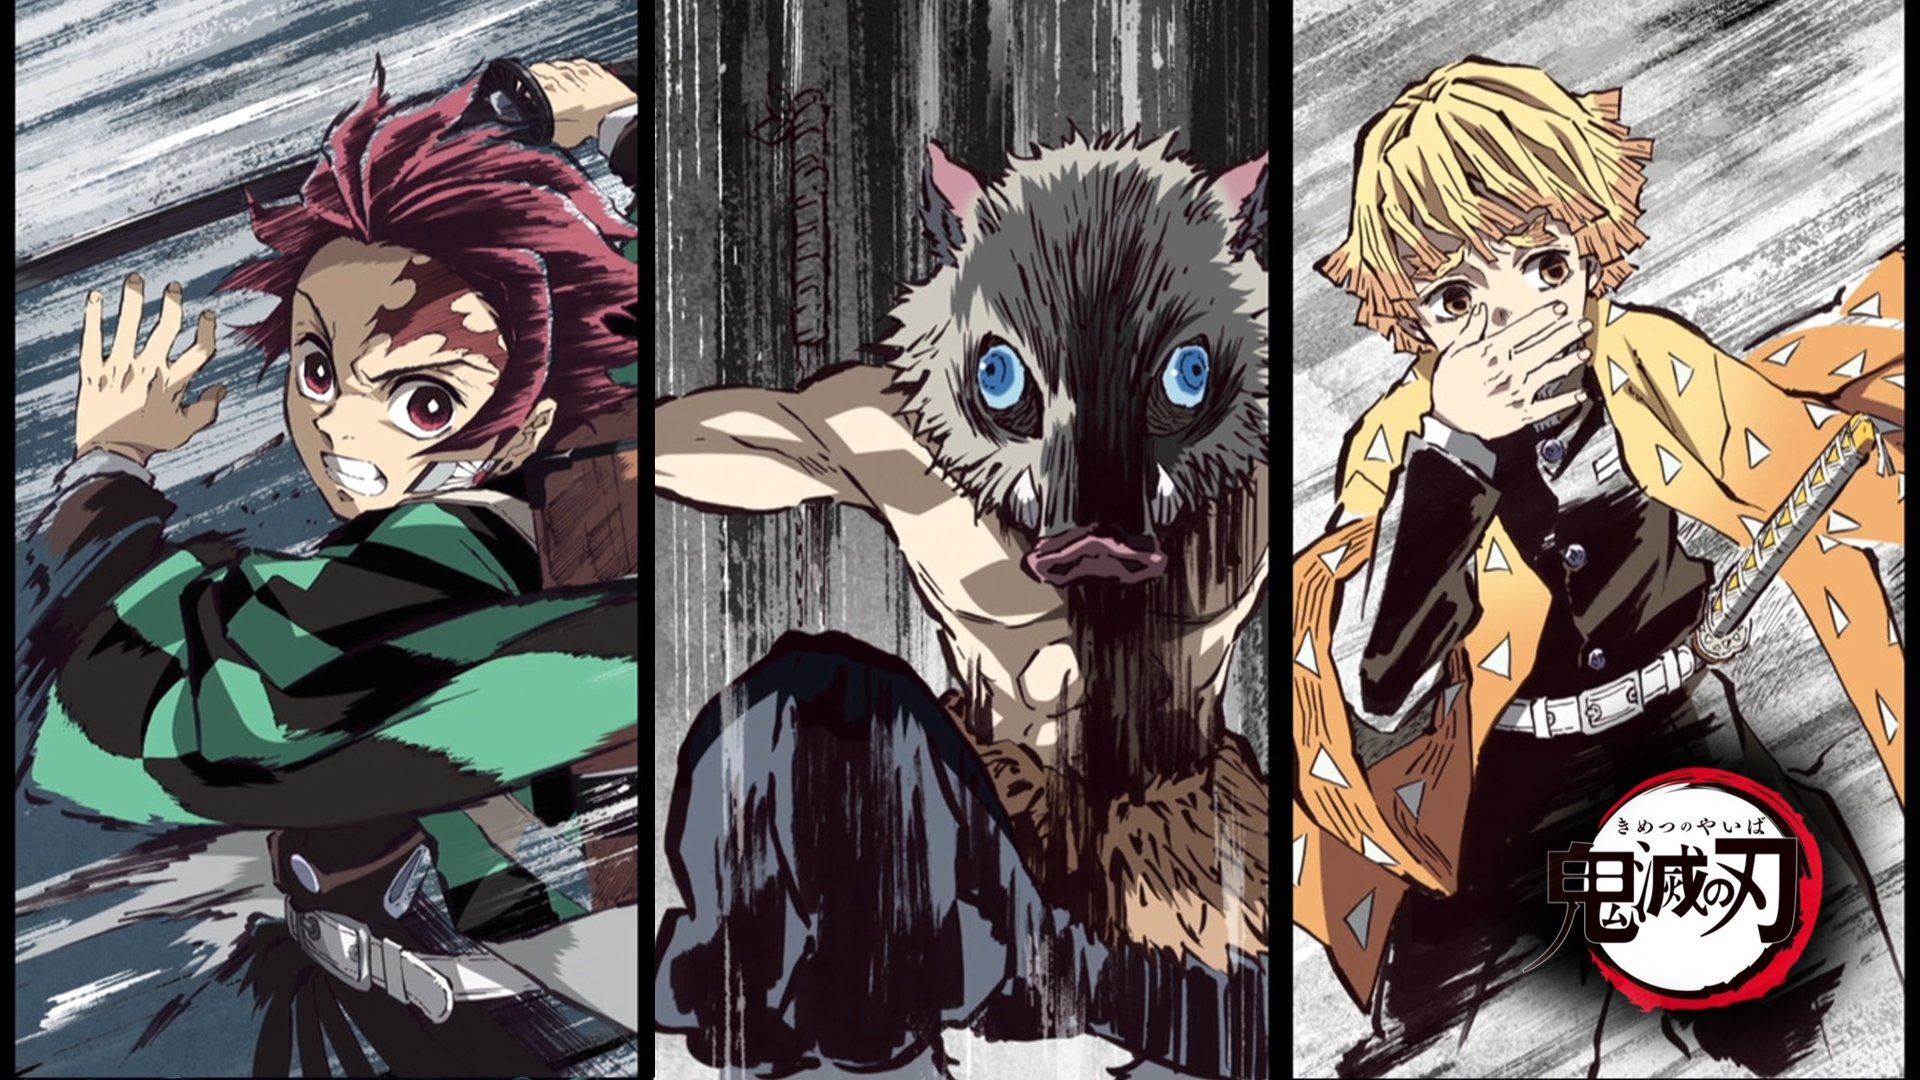 Demon Slayer: Kimetsu no Yaiba 4k Ultra HD Wallpaper | Background Image | 3840x2160 | ID:1039239 ...